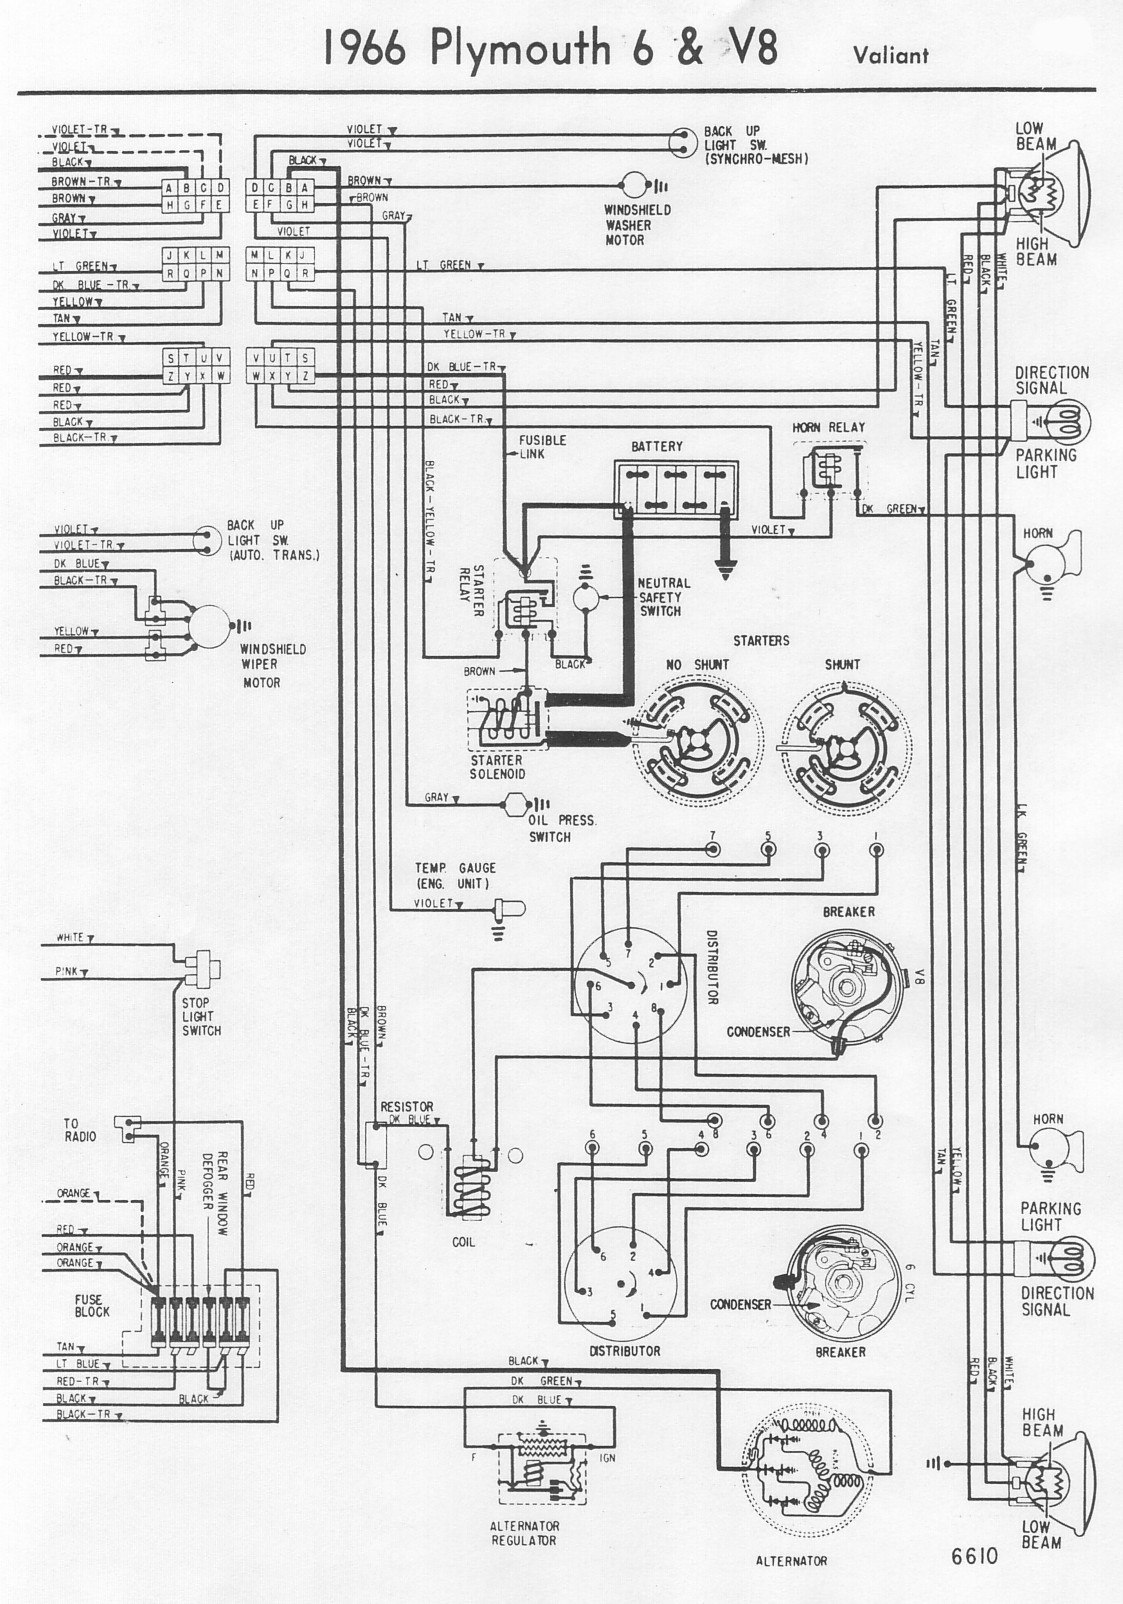 66ValiantB?quality\\=80\\&strip\\=all 1976 suzuki dr 250 wiring diagram suzuki gsx 750 wiring diagram ttr 250 wiring diagram at soozxer.org